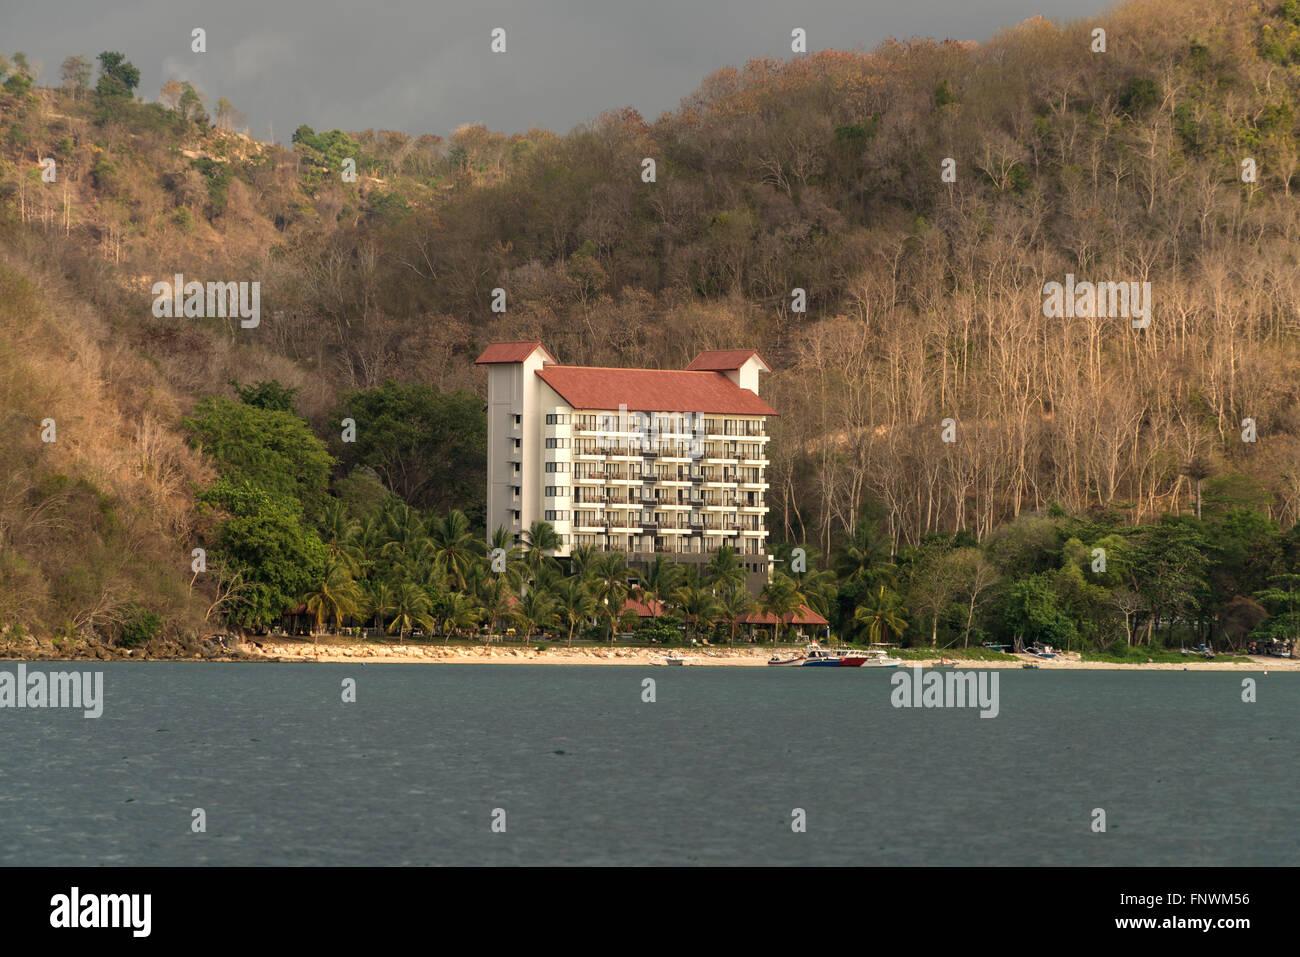 Laprima Hotel Labuan Bajo Flores Indonesien Asien Stockfoto